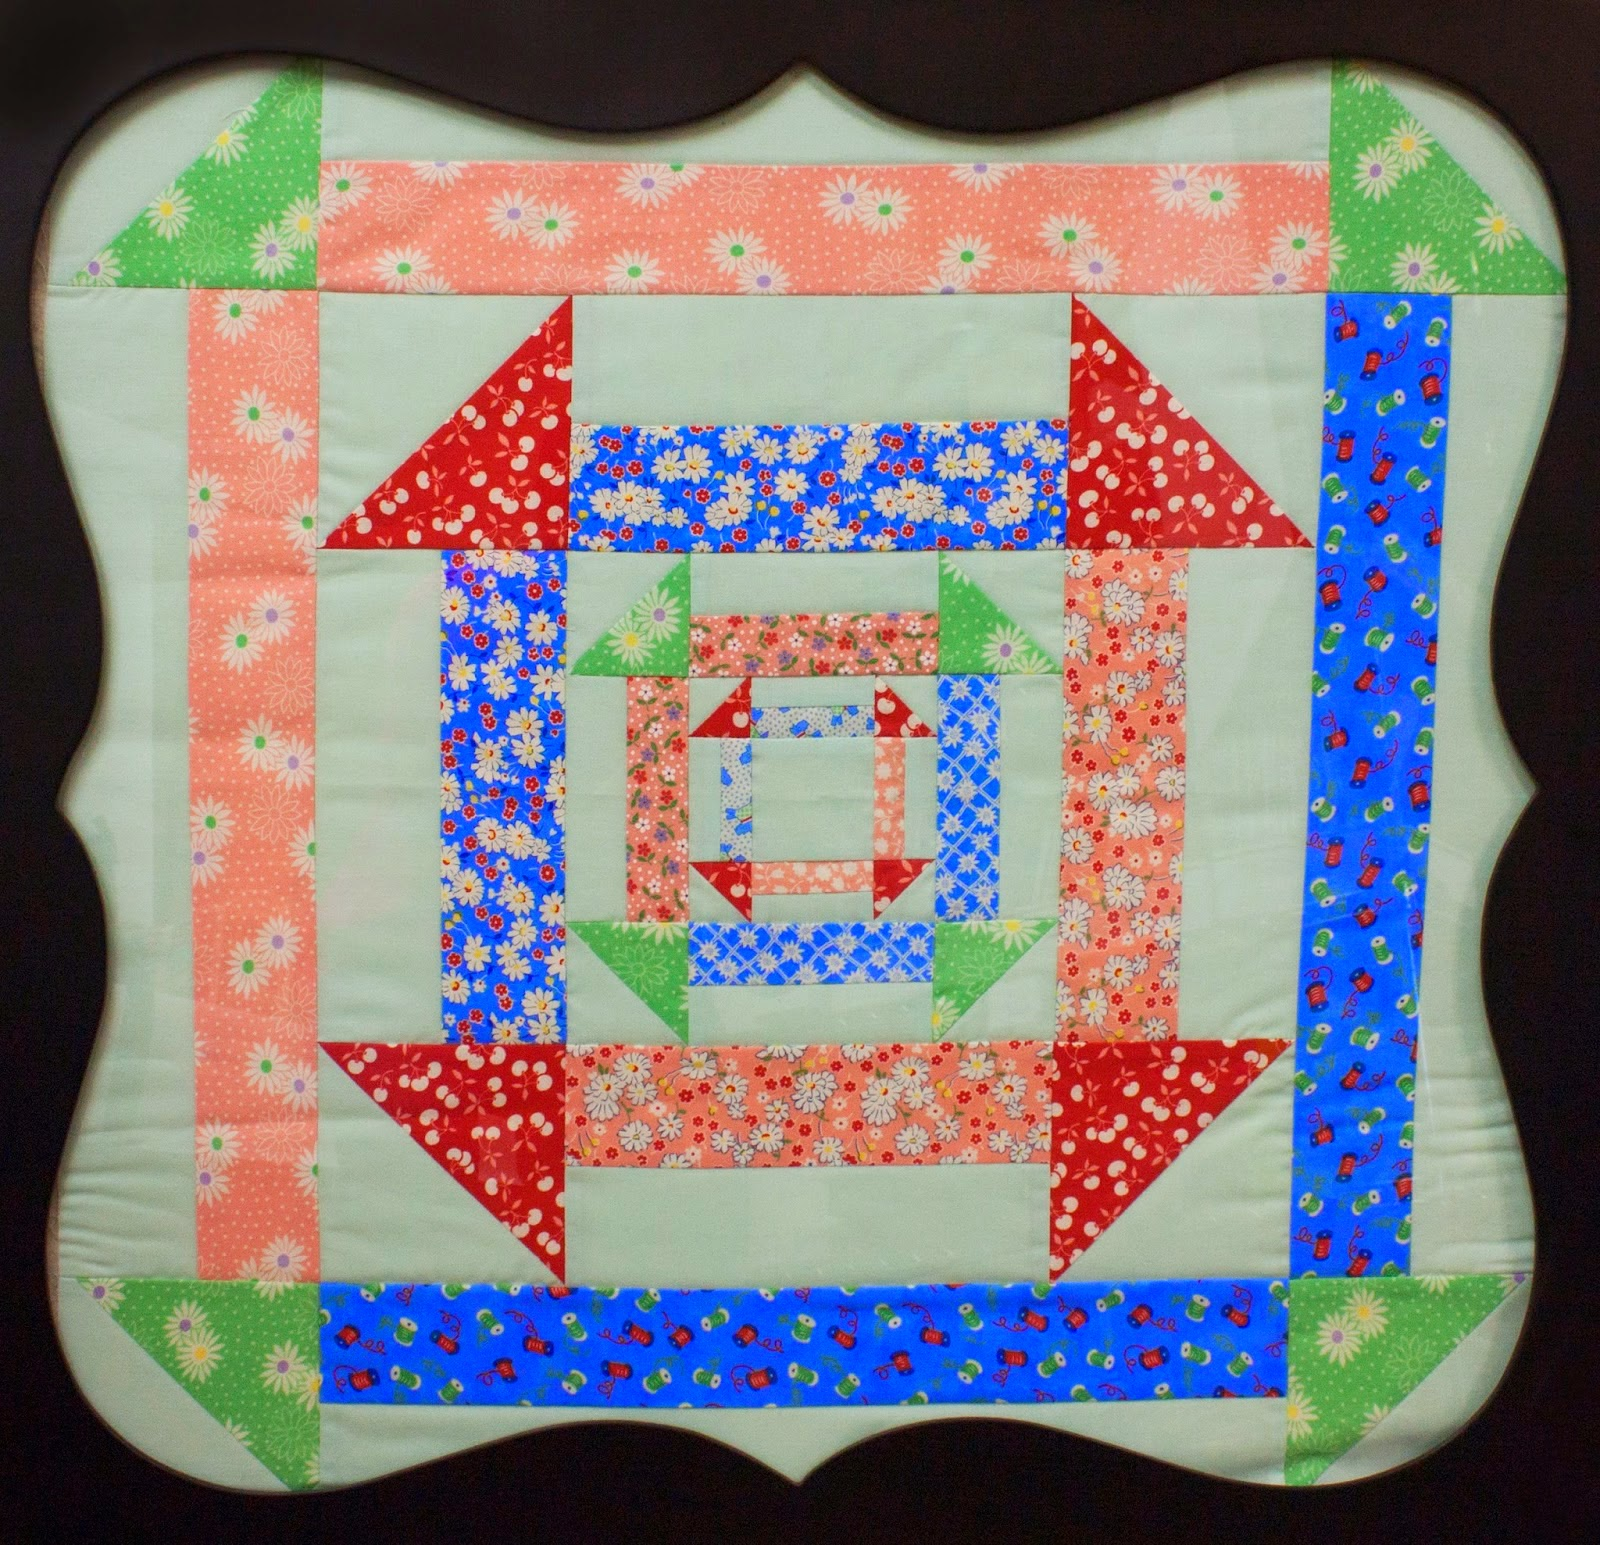 http://3.bp.blogspot.com/-l4sQ7MhS6nw/U51GC8Cw49I/AAAAAAAAQKw/fLVI4mFrzoc/s1600/nested+churn.jpg